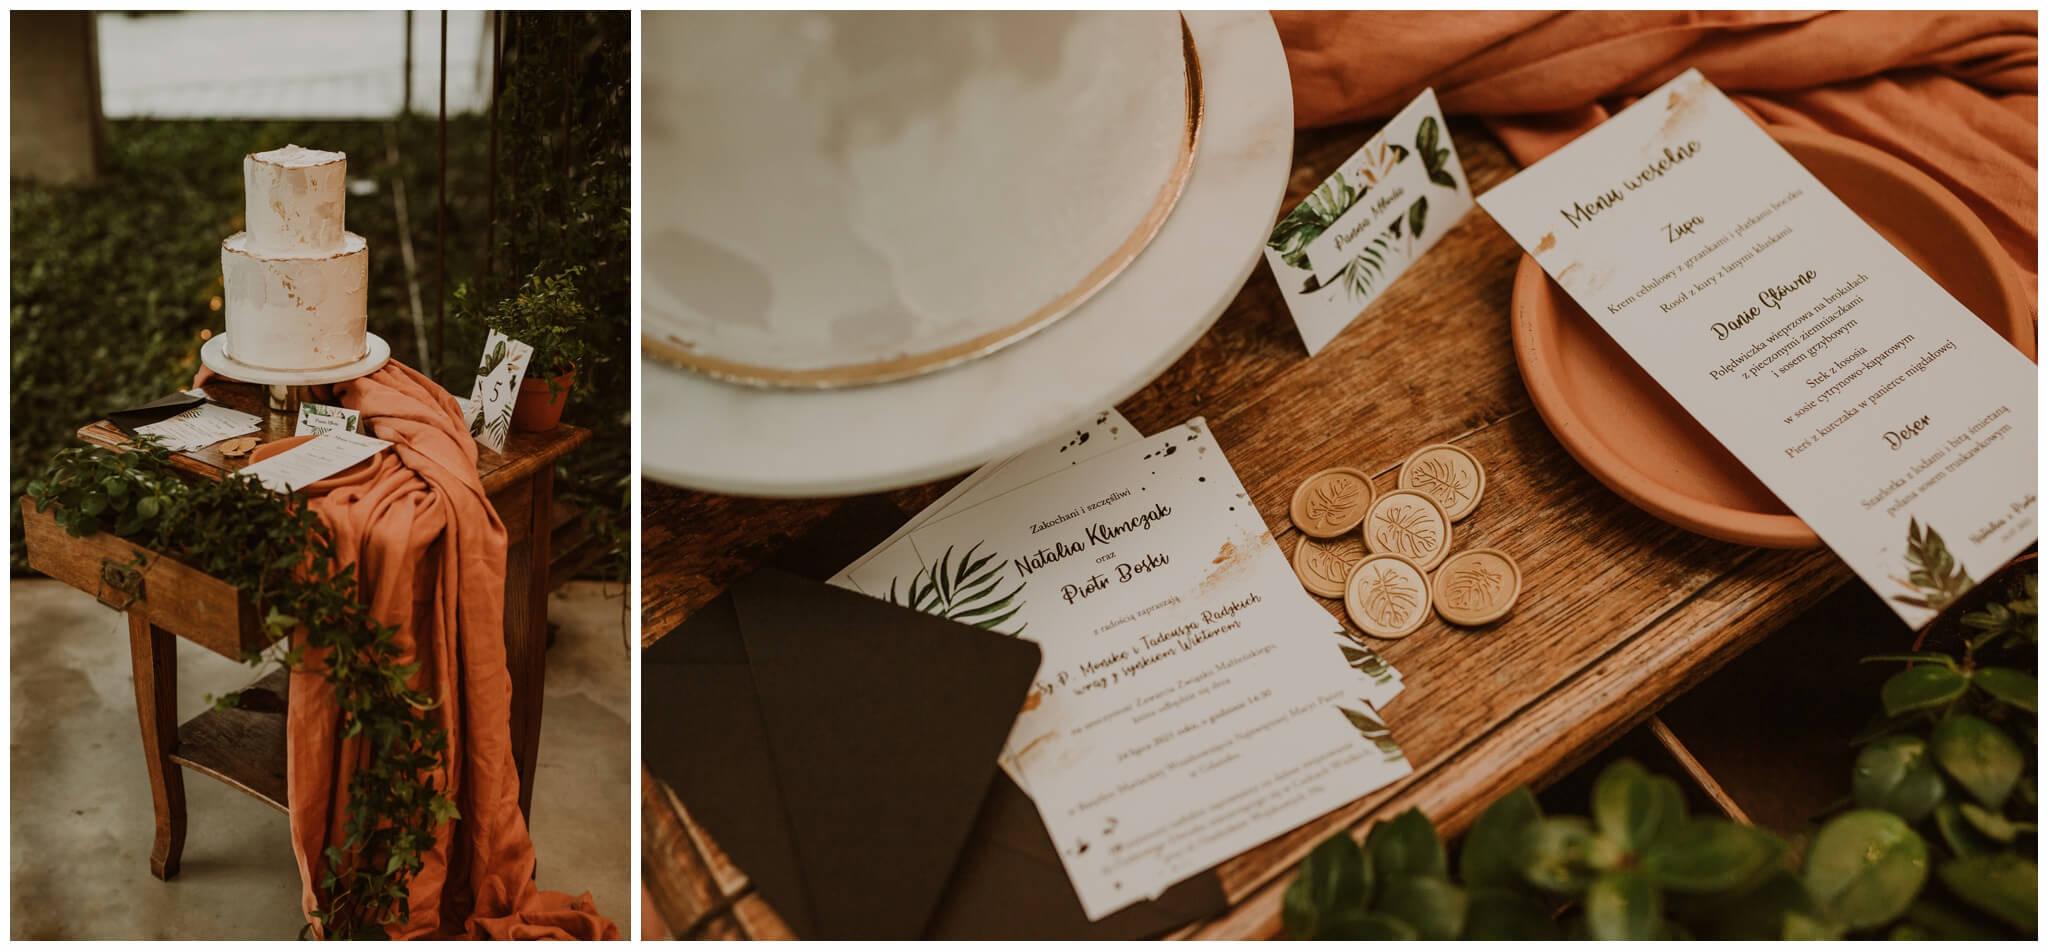 sesja stylizowana modern boho design your wedding